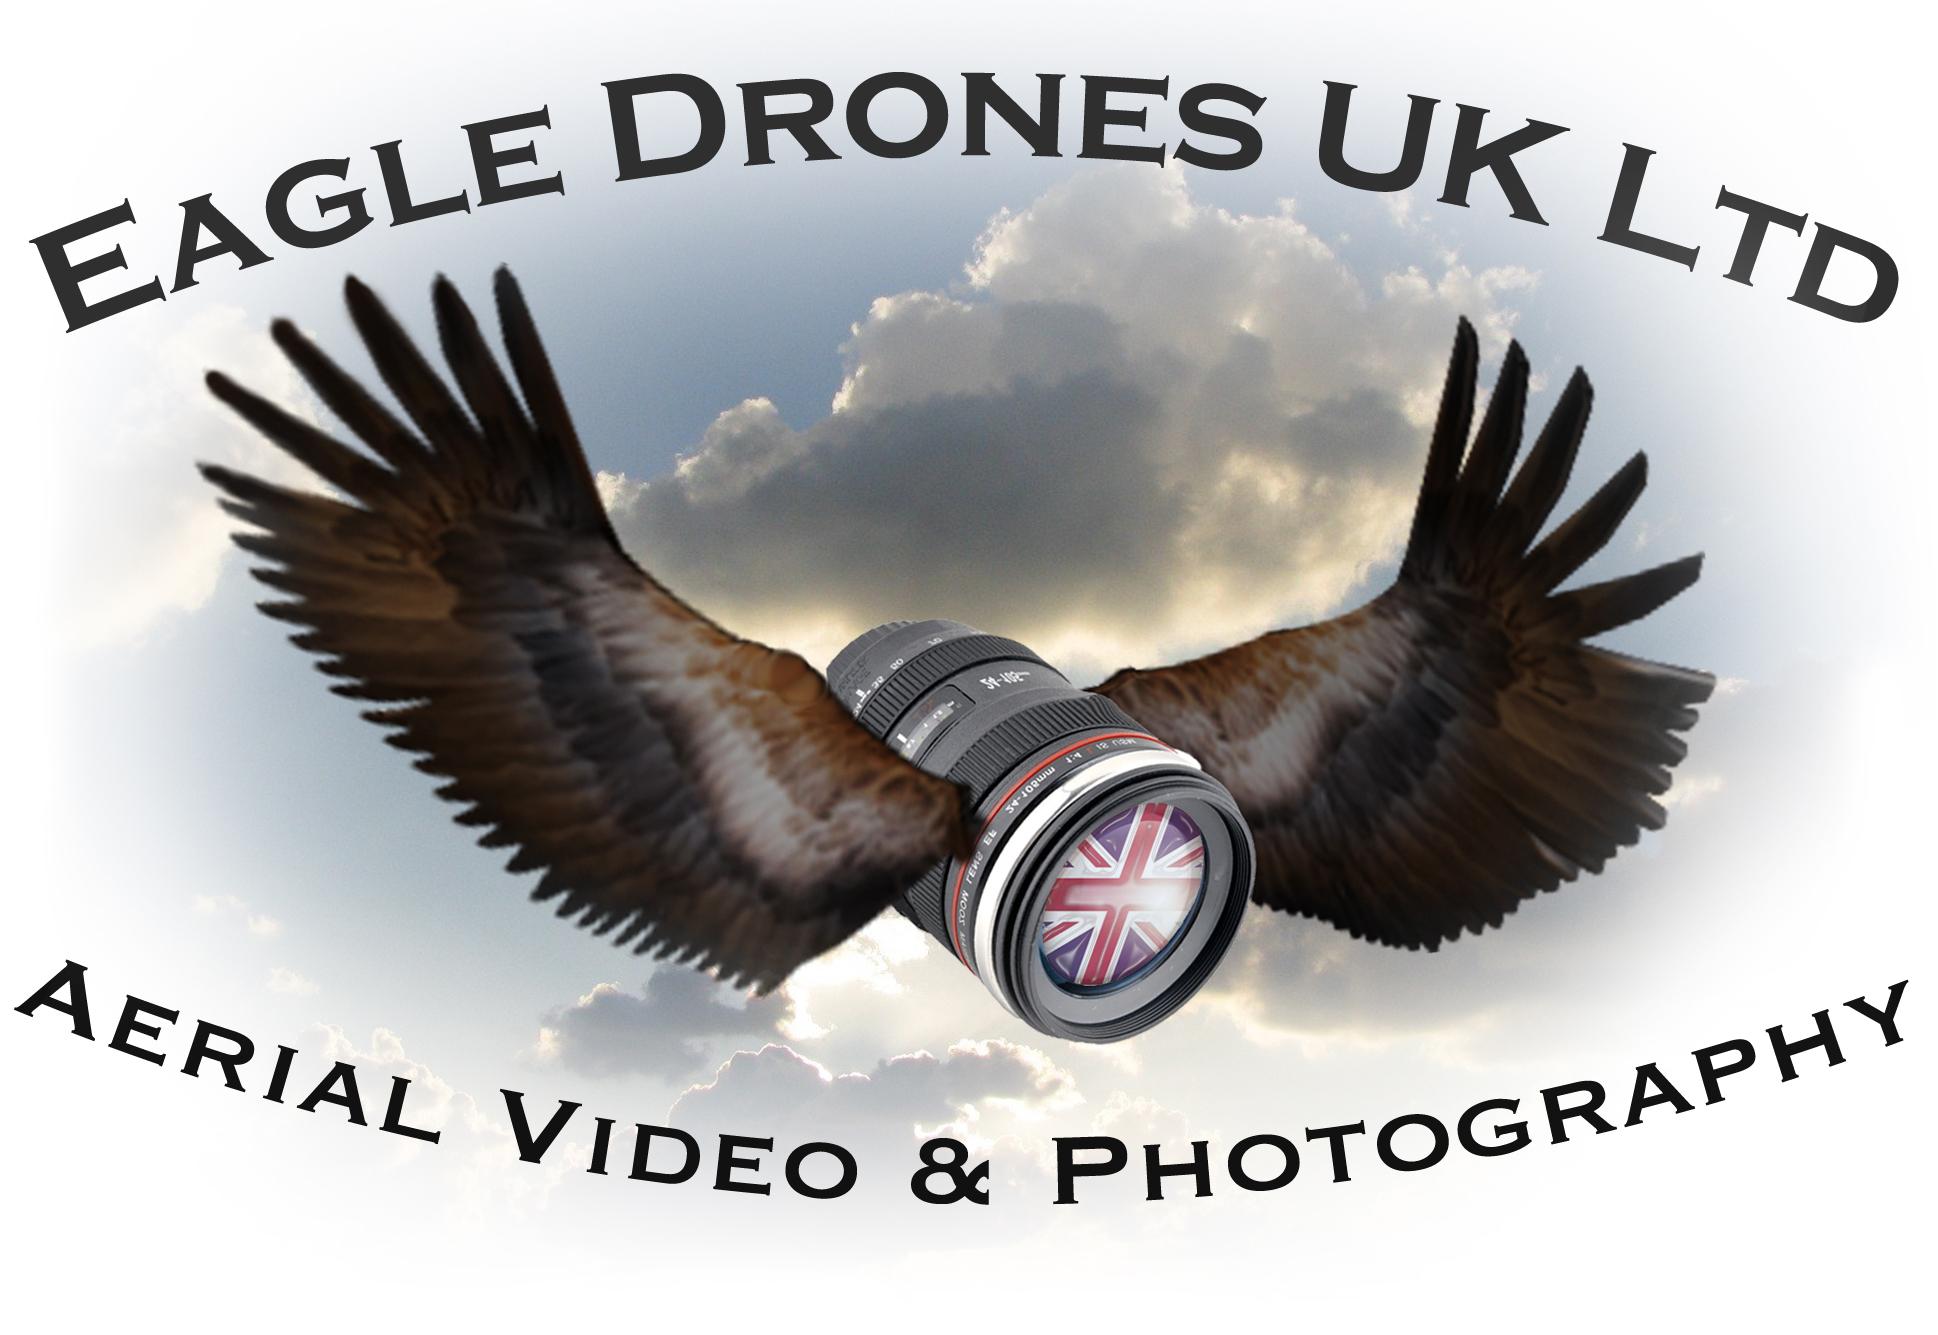 EAGLE DRONES UK Ltd